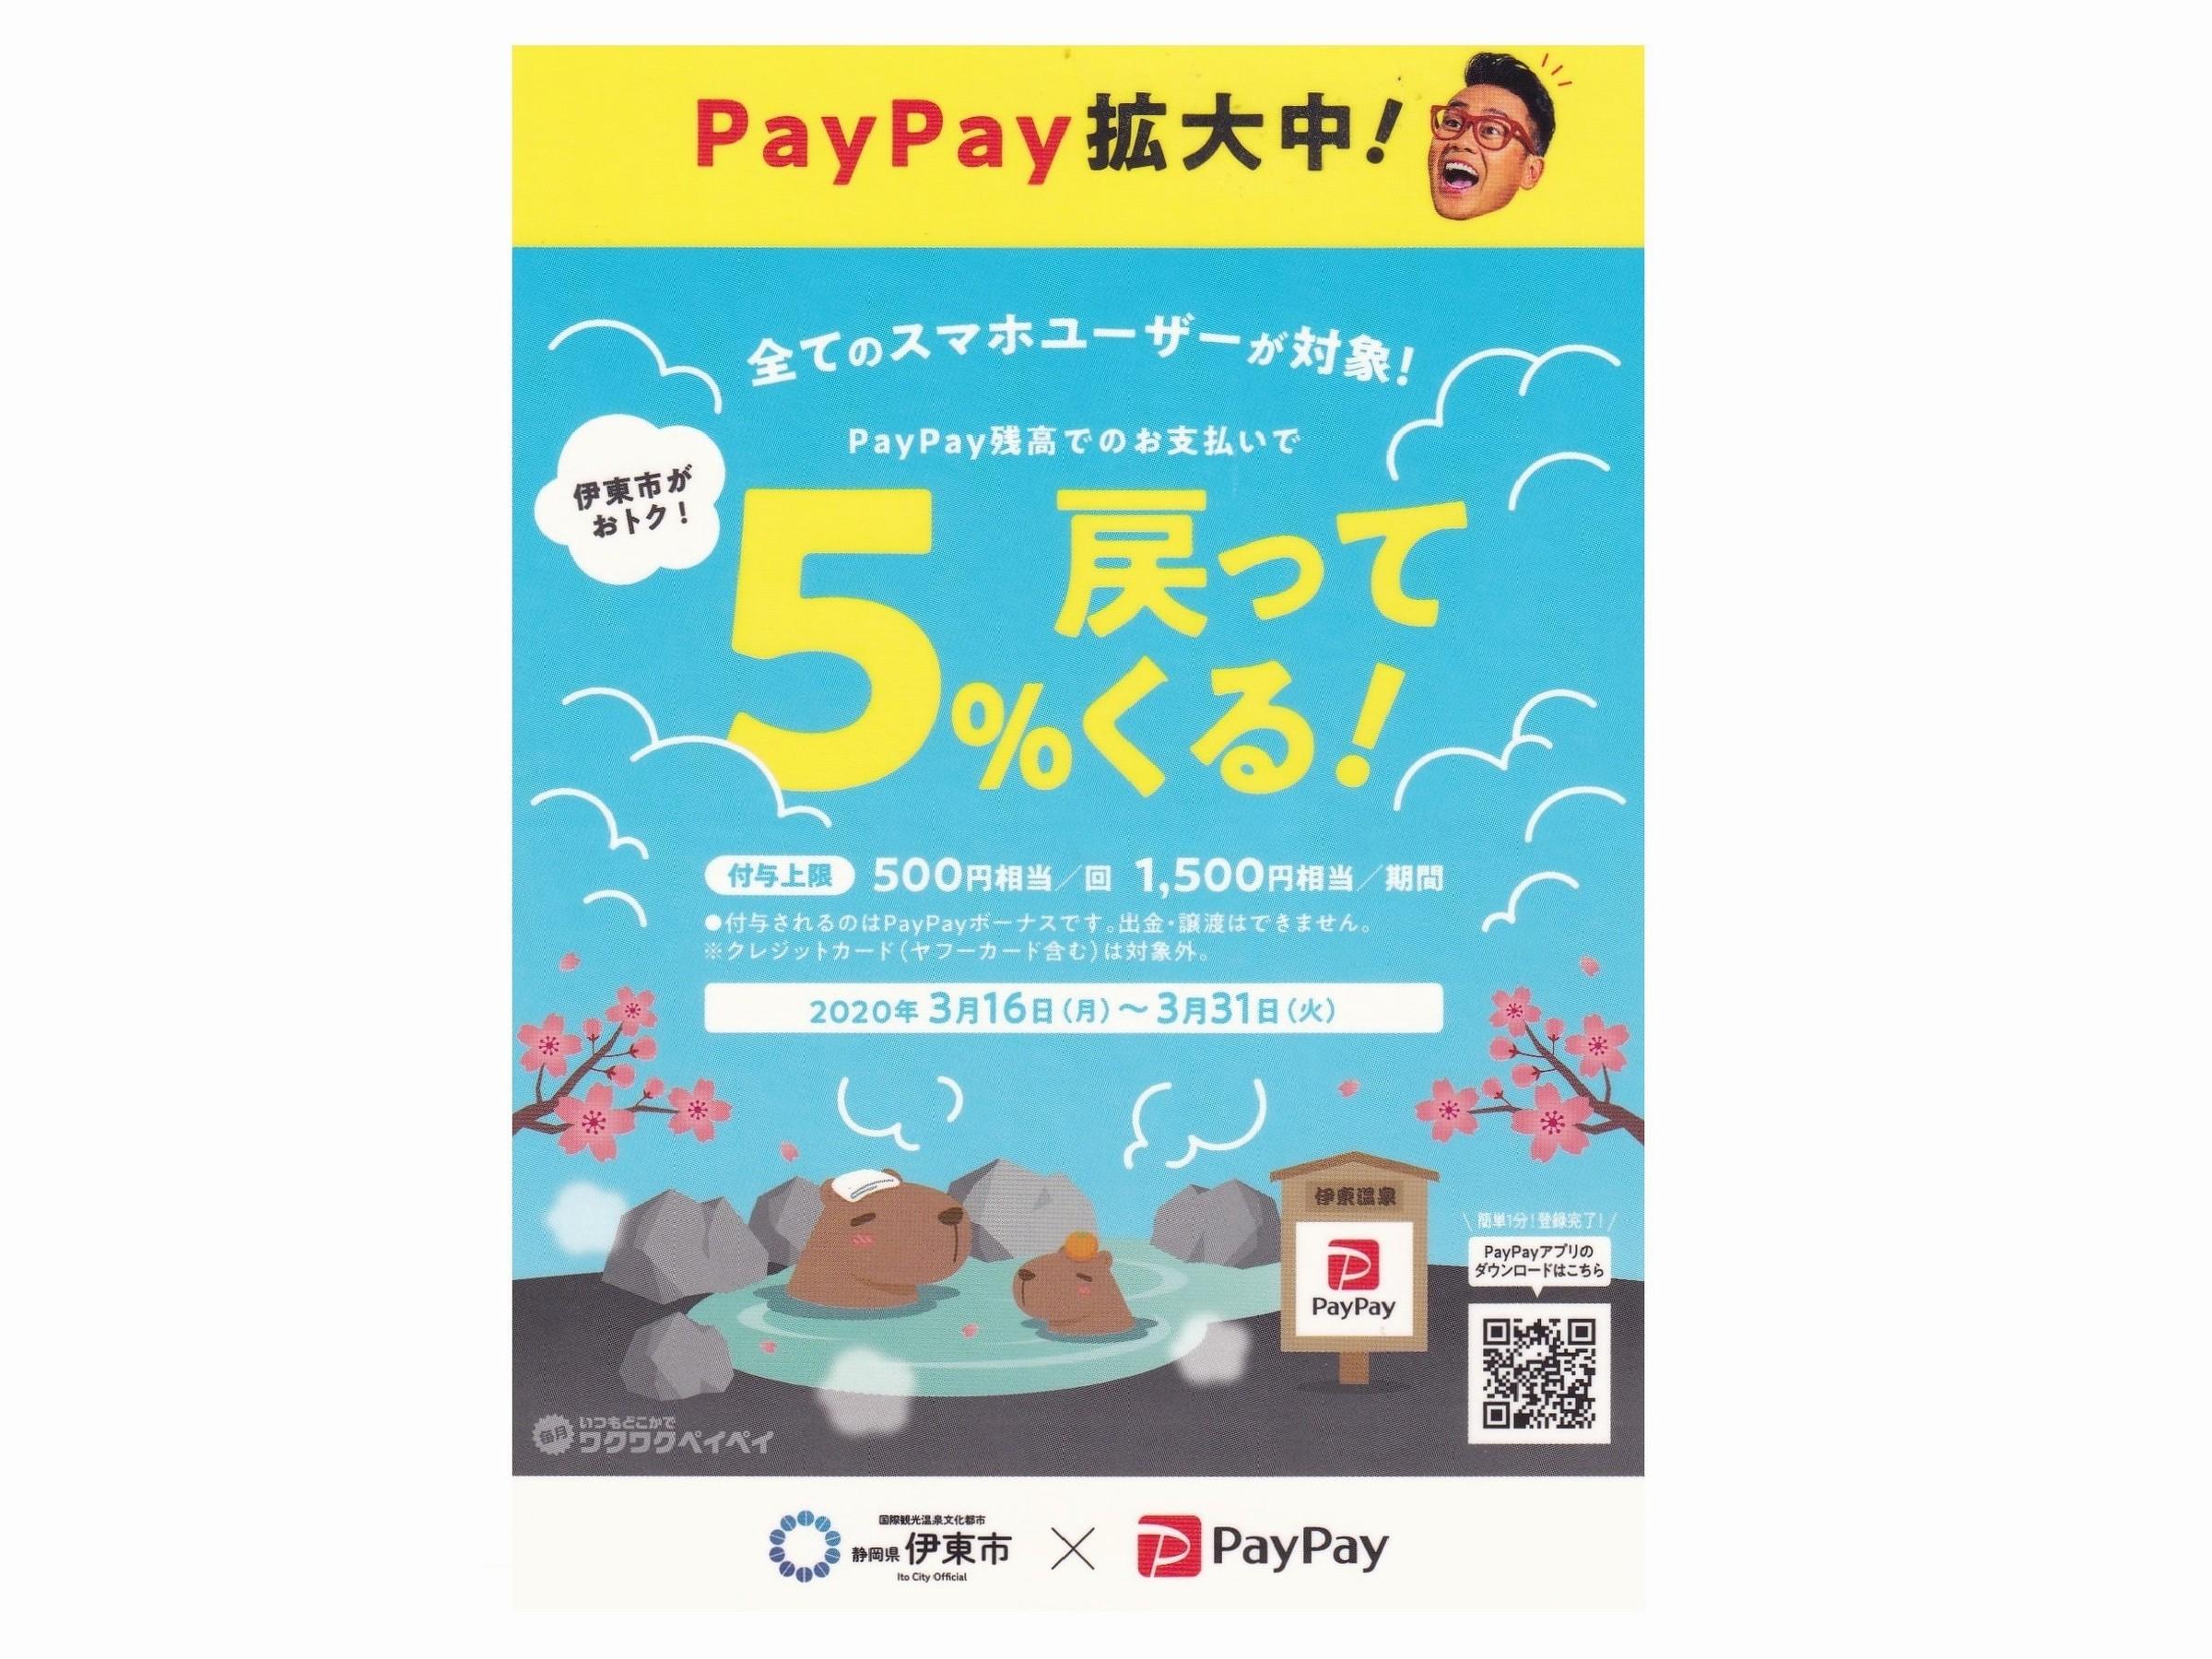 https://www.magaret.jp/mt_img/PayPay%EF%BC%8B5%EF%BC%85_JALAN_200314.jpg